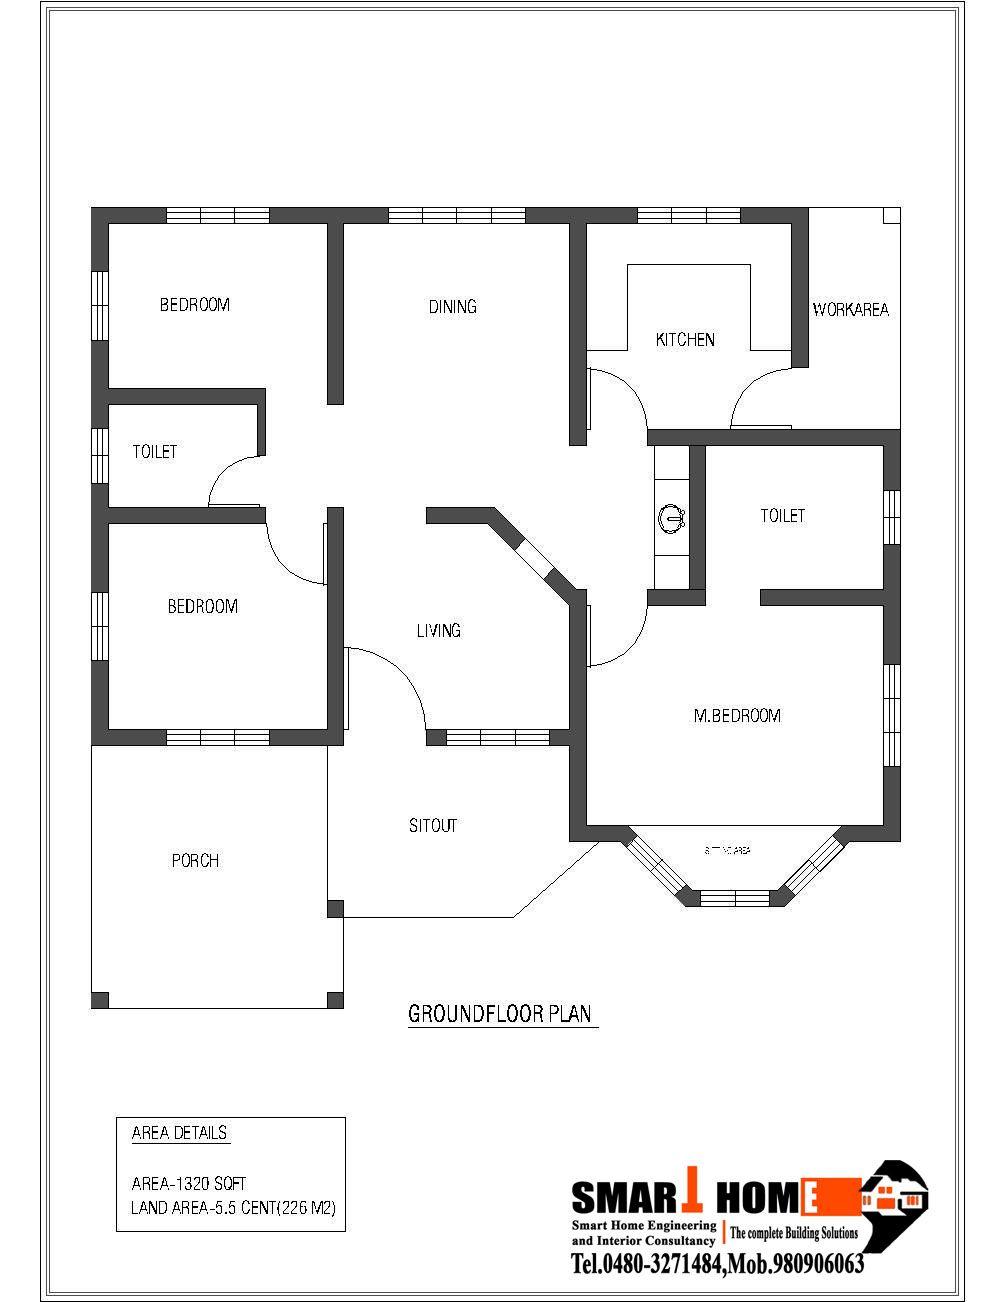 1320 Sqft Kerala Style 3 Bedroom House Plan From Smart Home Gf Plan Garage House Plans Floor Plan Design House Plans